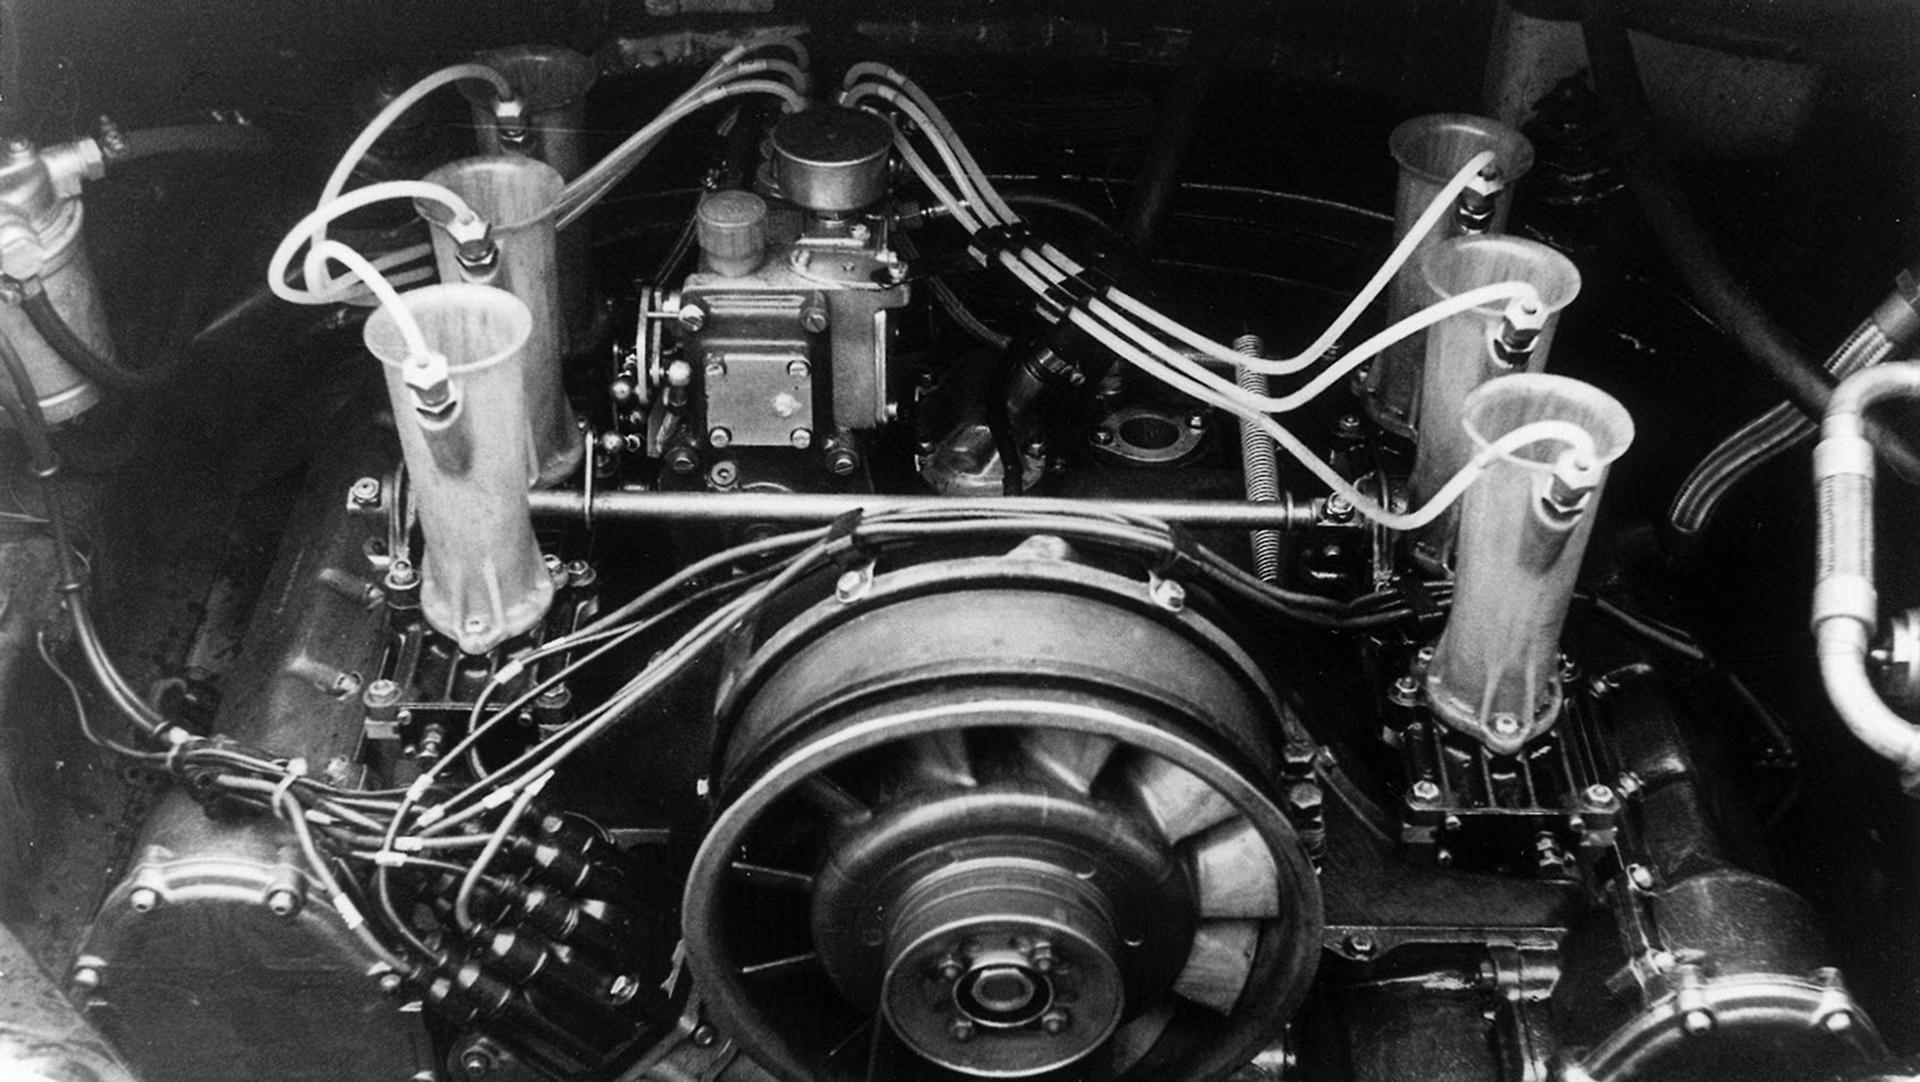 Six-cylinder engine 911 R 2,0 Coupé, 1967 © Dr. Ing. h.c. F. Porsche AG